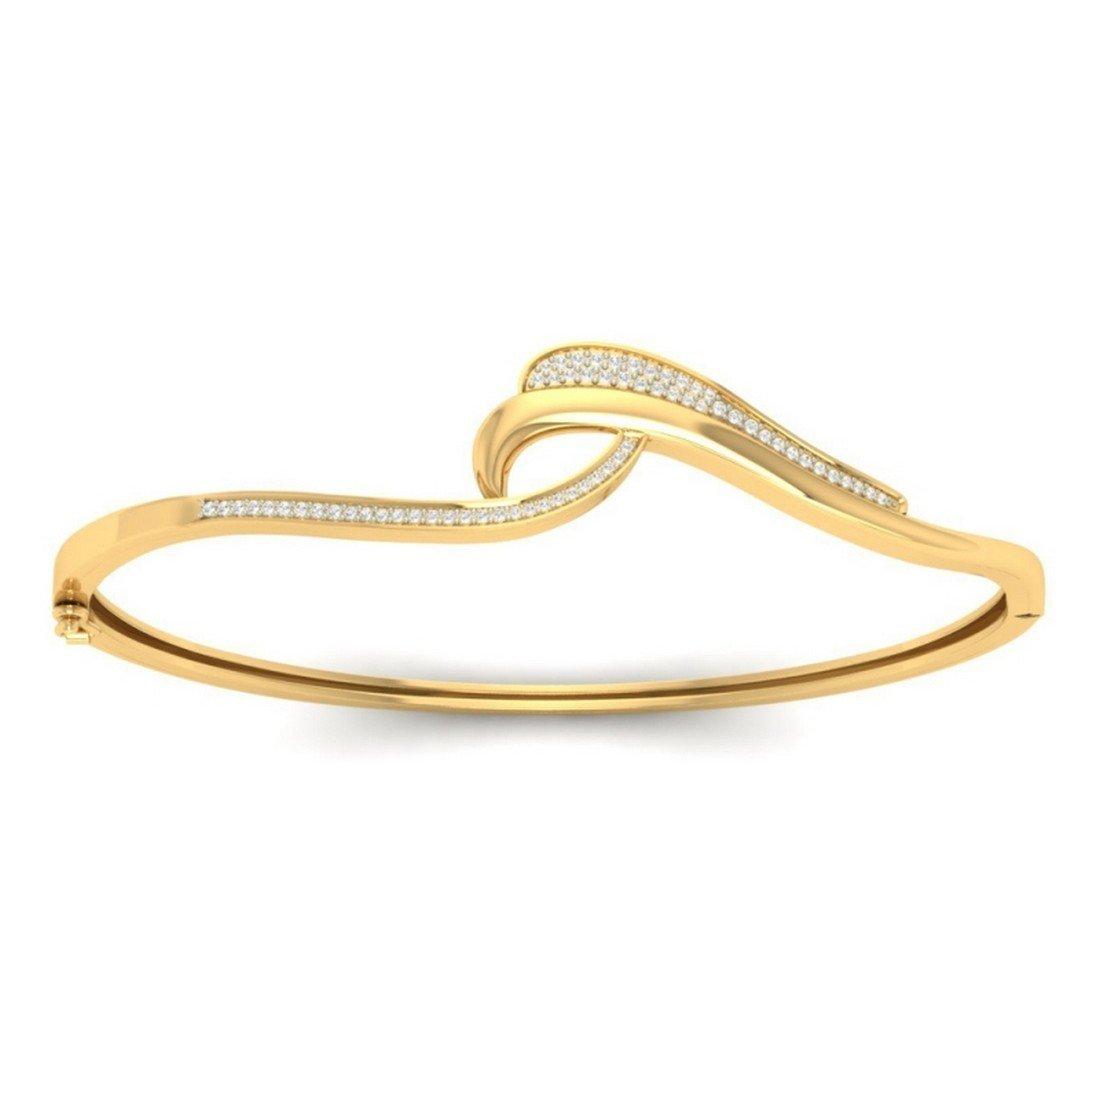 HallMarked 14K Yellow Gold bangle-bracelets Size IJ| SI 8 inches 1.2 cttw Round-Cut-Diamond